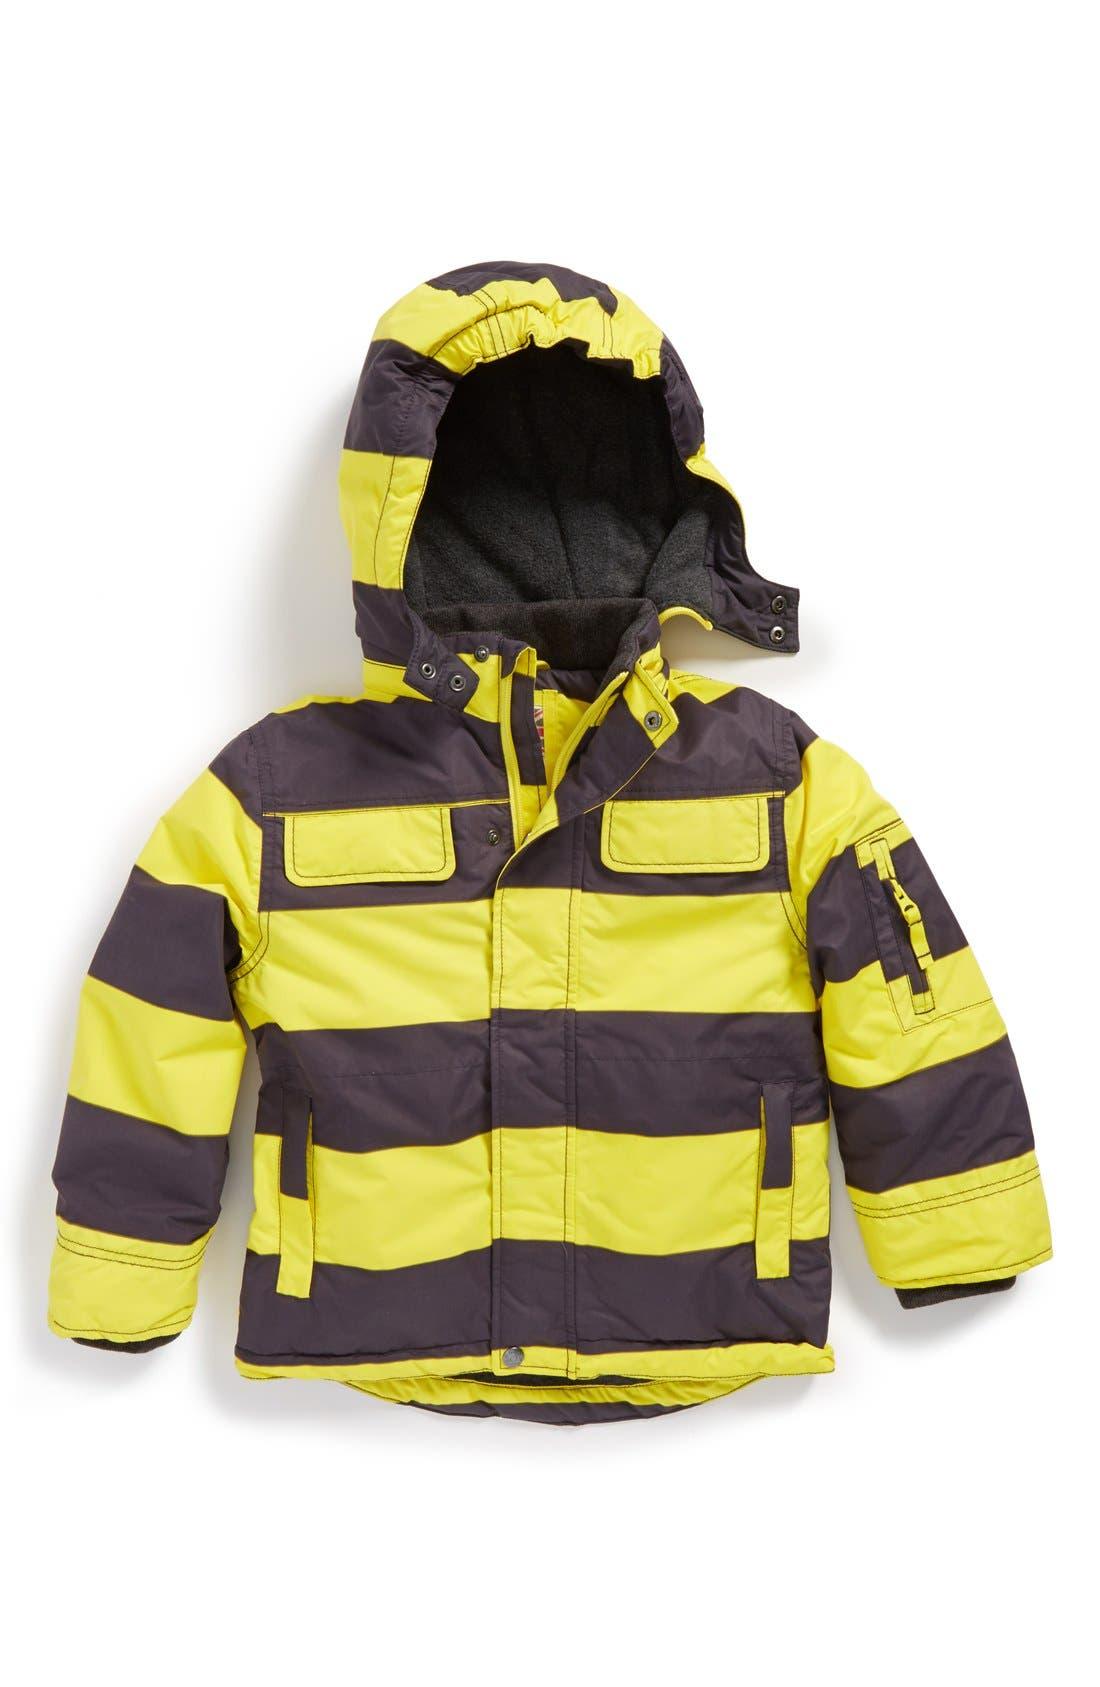 Alternate Image 1 Selected - Mini Boden 'Snowboard' Waterproof Jacket (Toddler Boys, Little Boys & Big Boys)